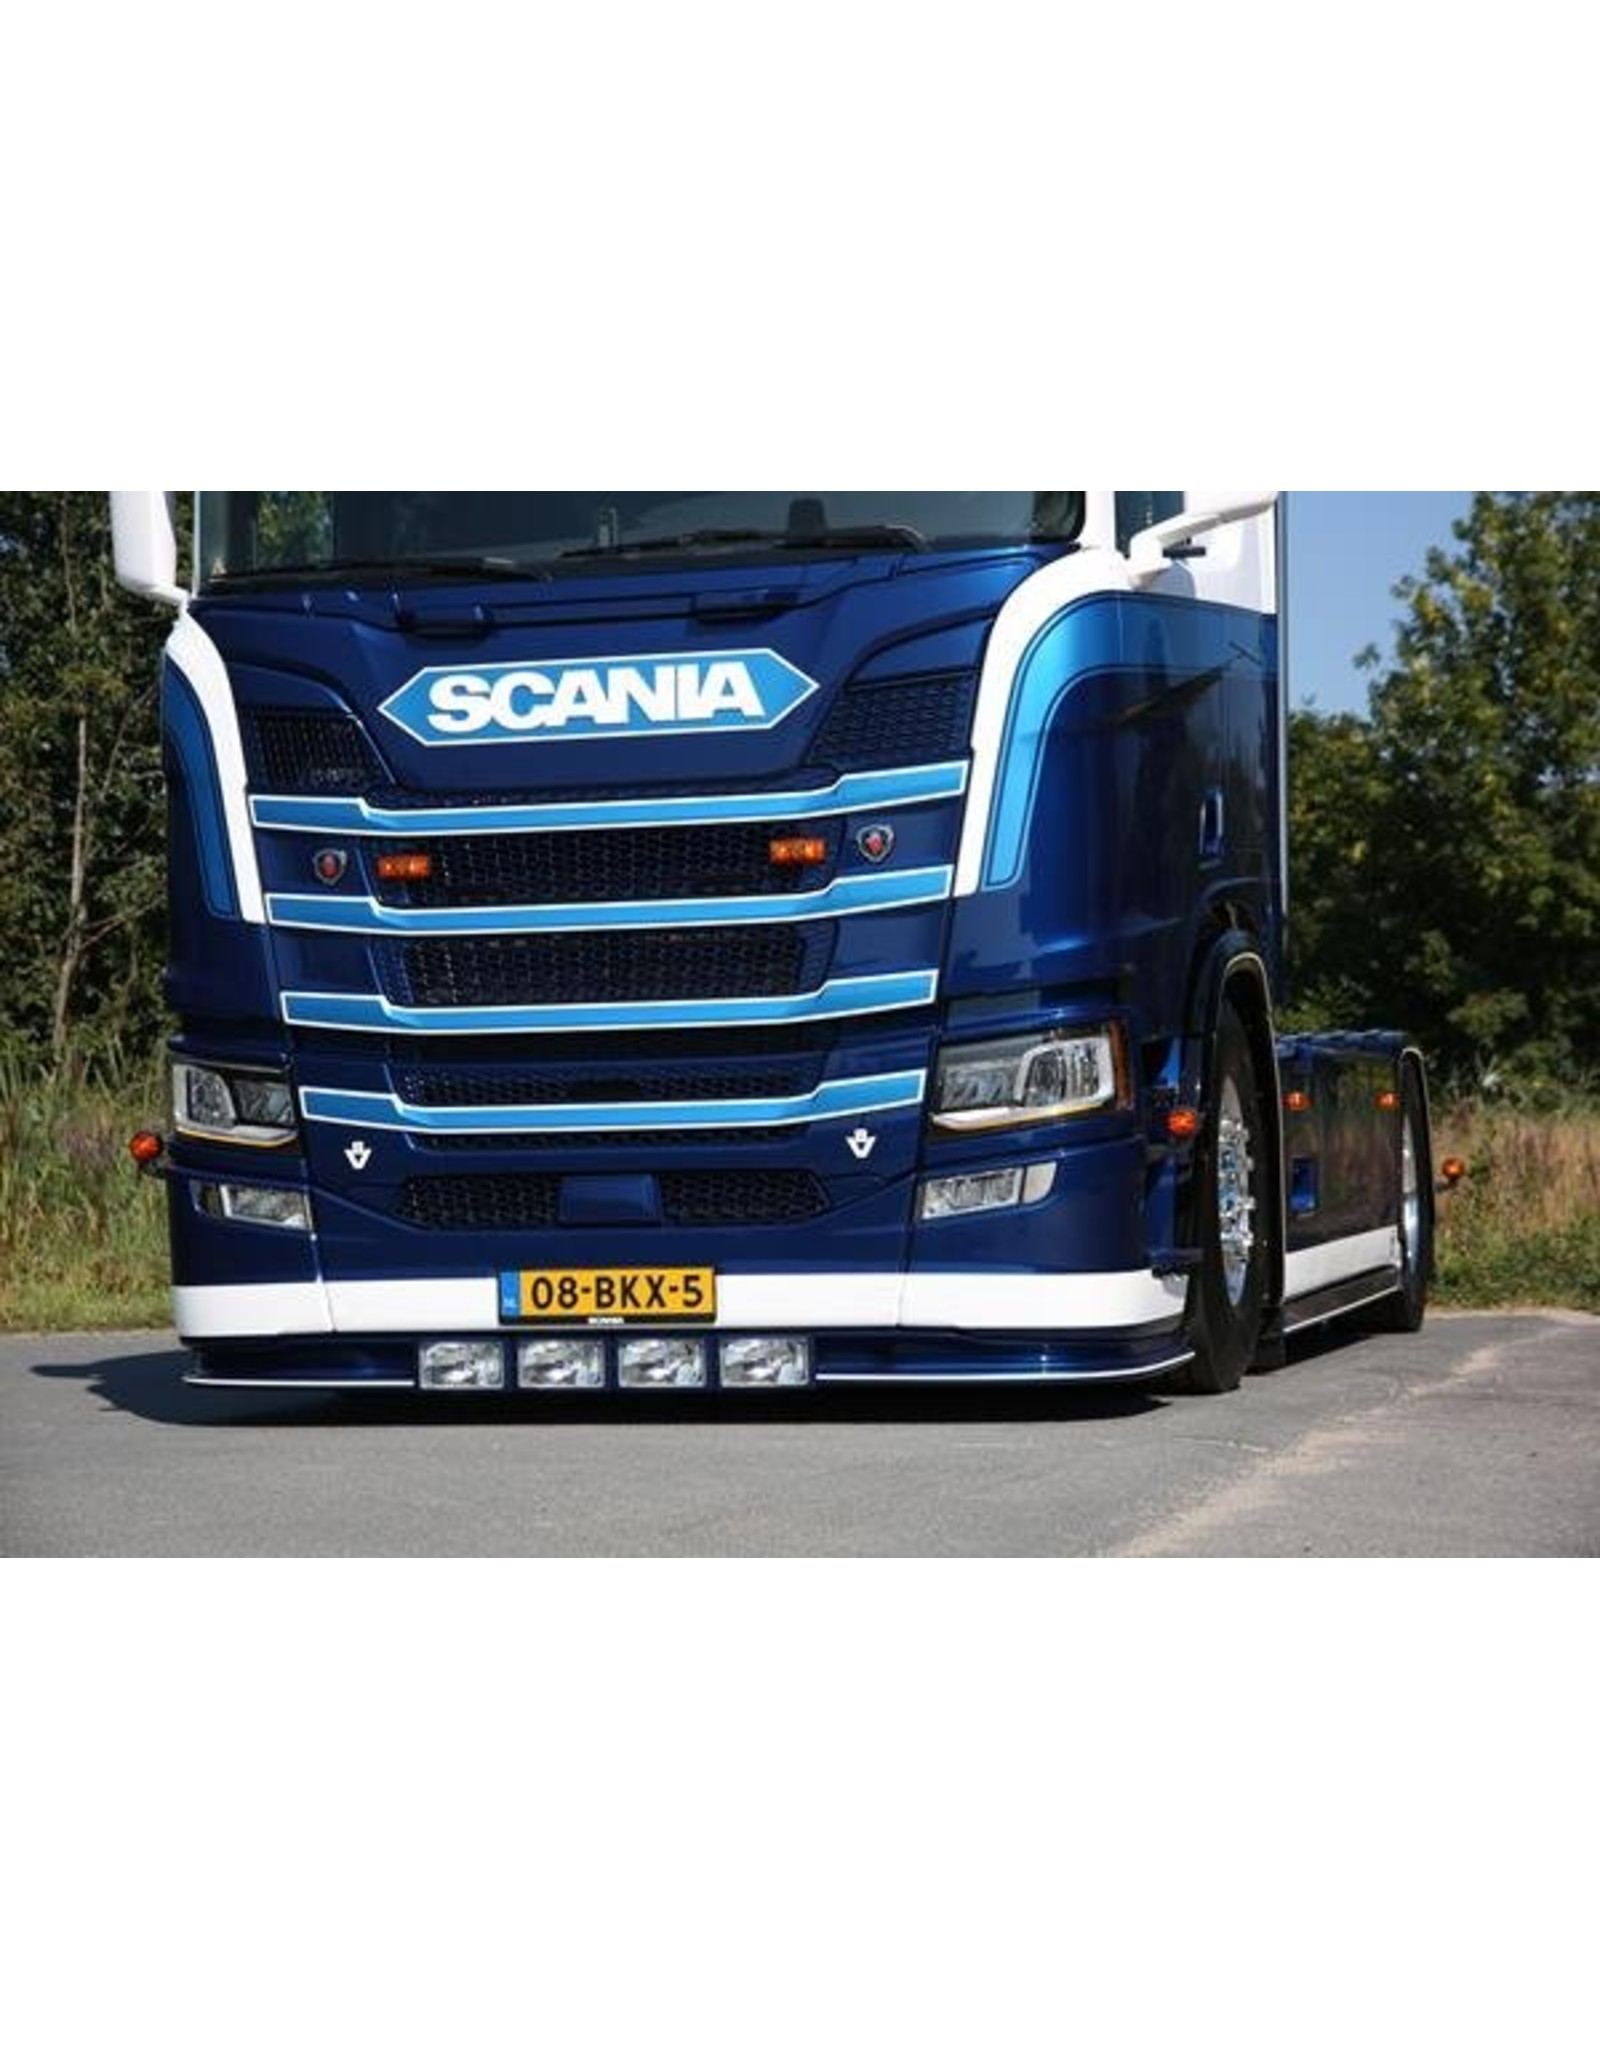 Scania Bumper Spoiler Scania NG